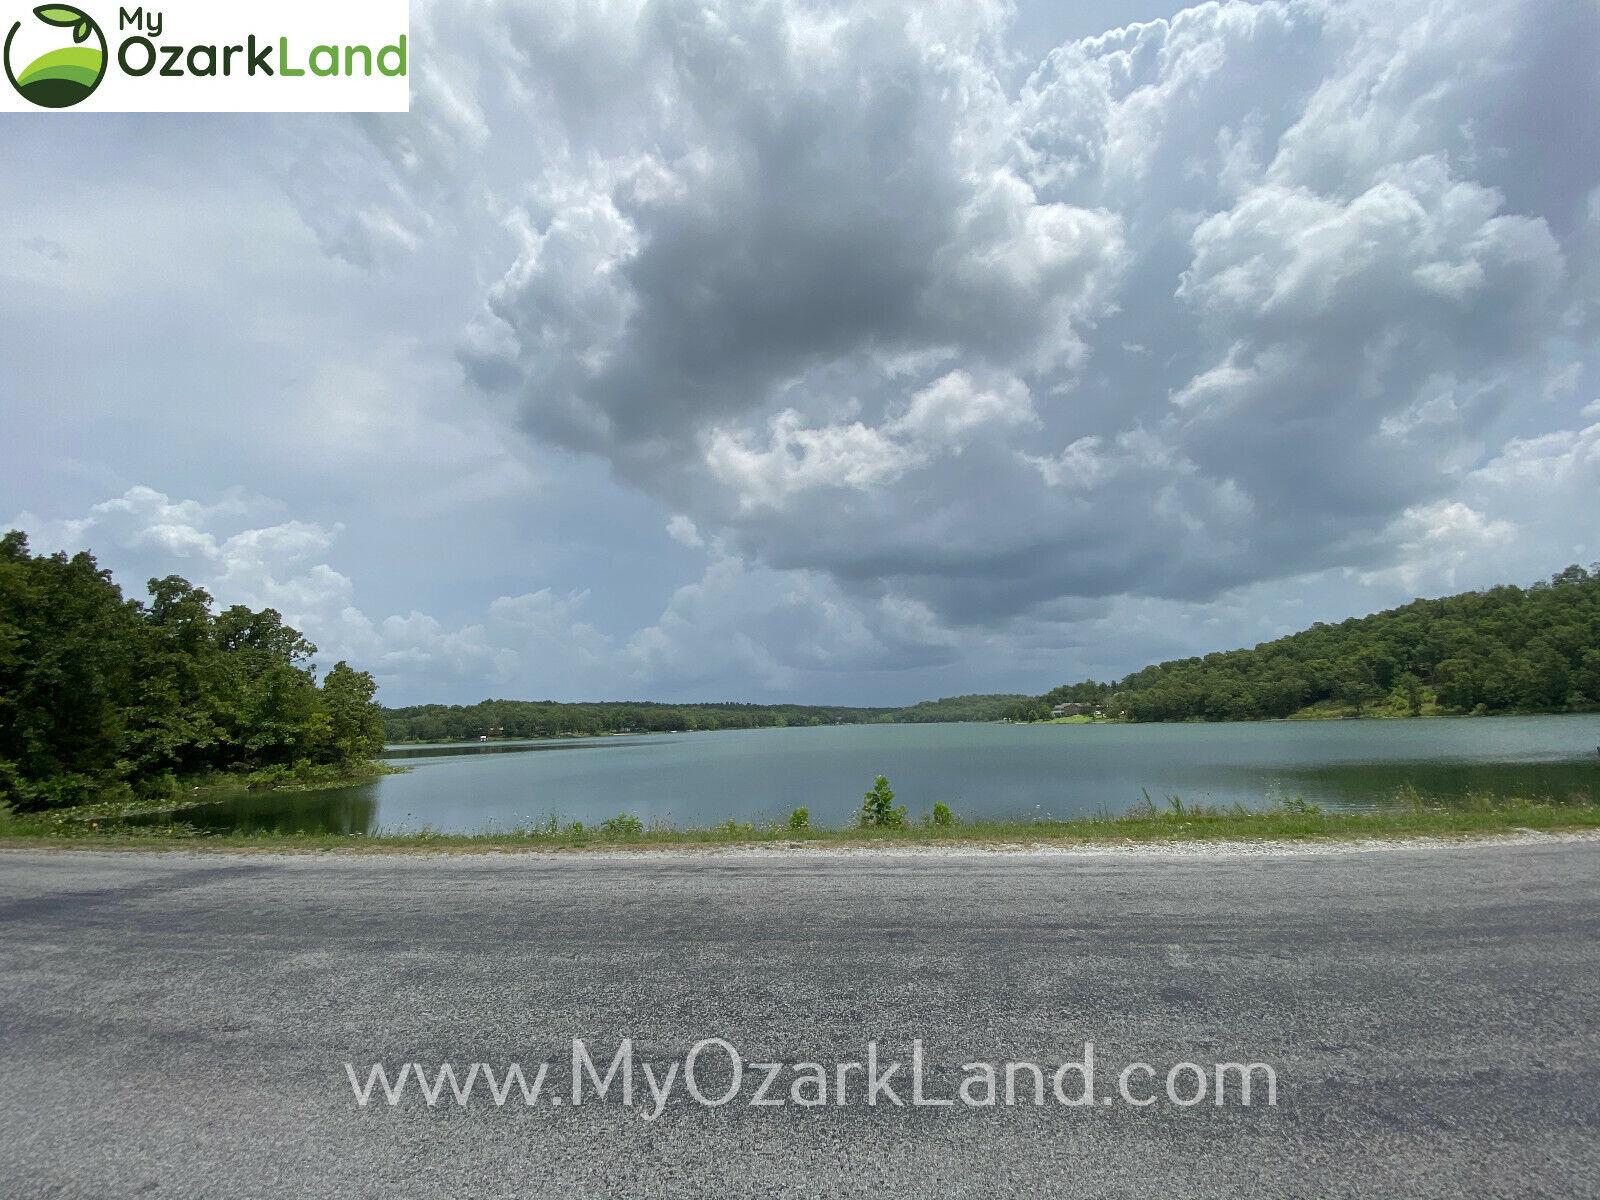 MyOzarkLand Own Land Near The Best Bass Fishing Spot In Arkansas-HorseshoeBend - $6.50